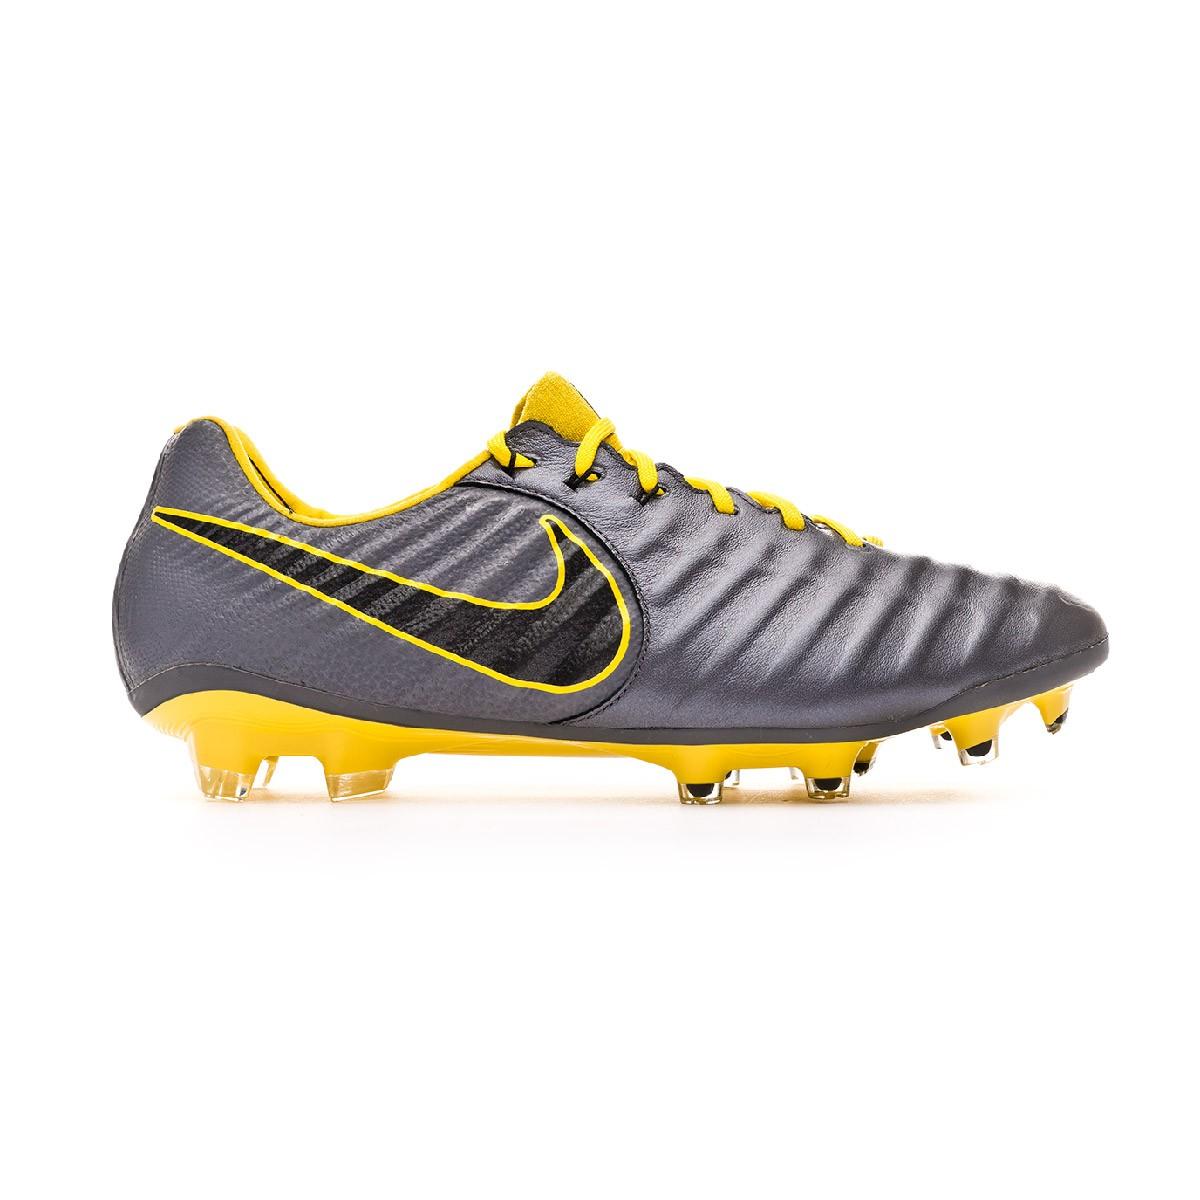 Erudito Error Deshabilitar  Football Boots Nike Tiempo Legend VII Elite FG Dark grey-Optical  yellow-Black - Football store Fútbol Emotion